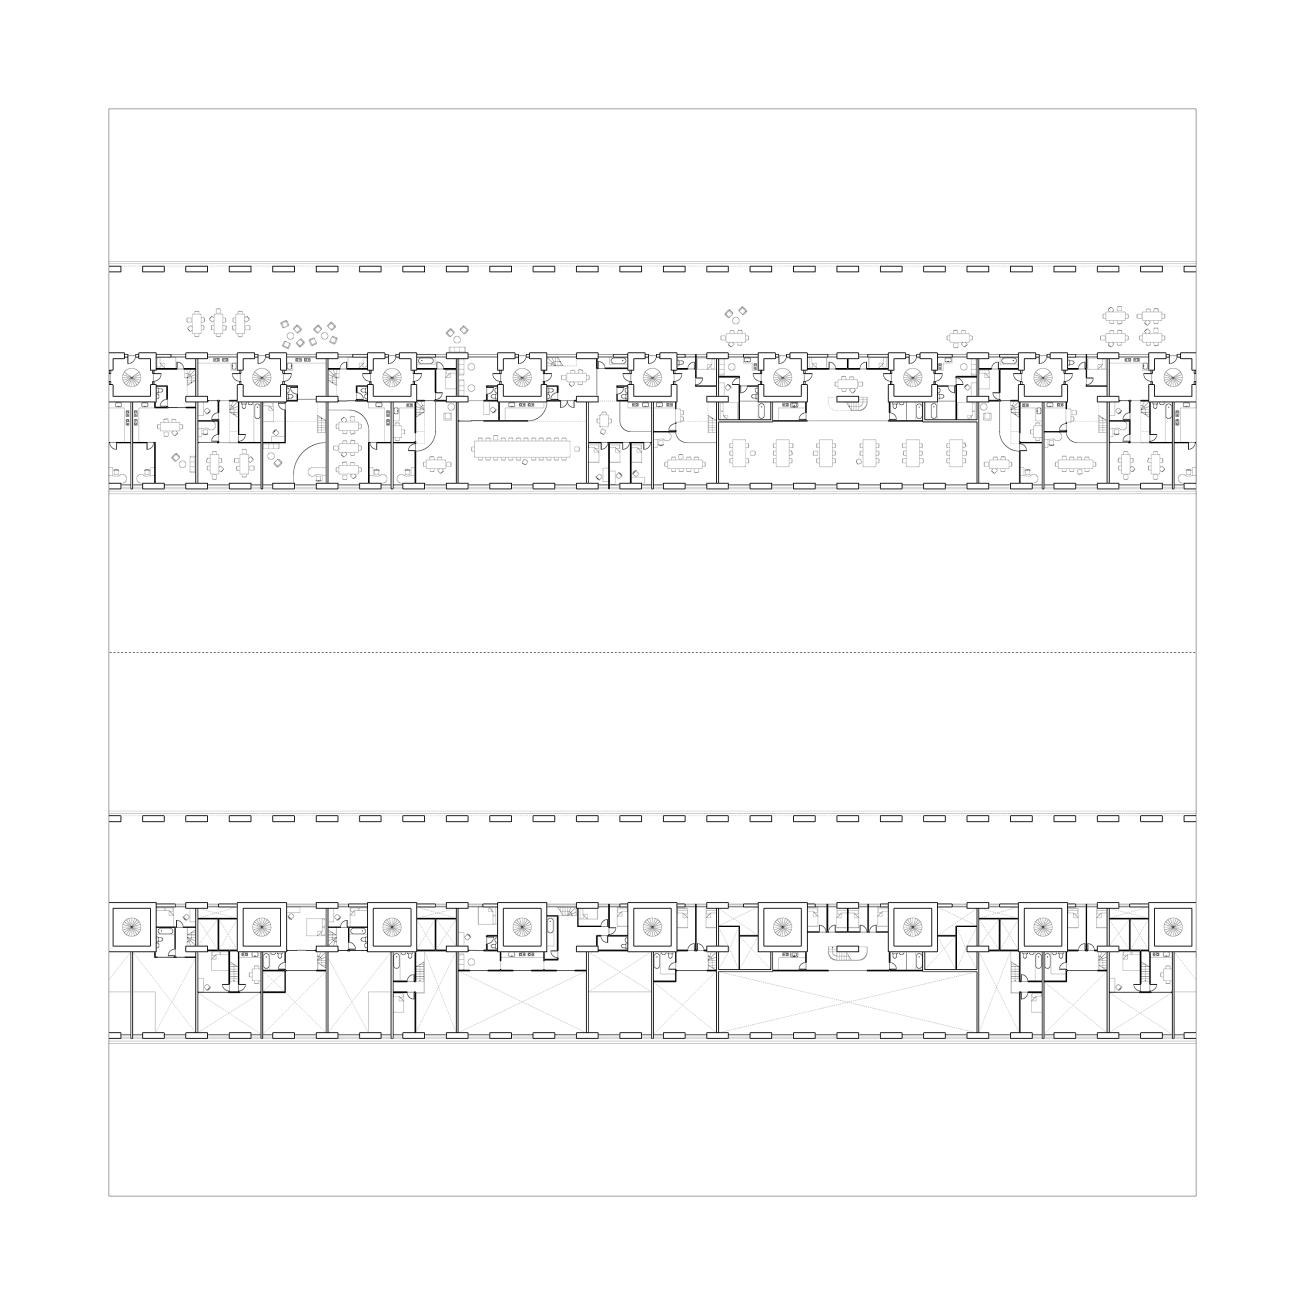 Villages 05 Typical Plan - Ground Floor and Mezzanine